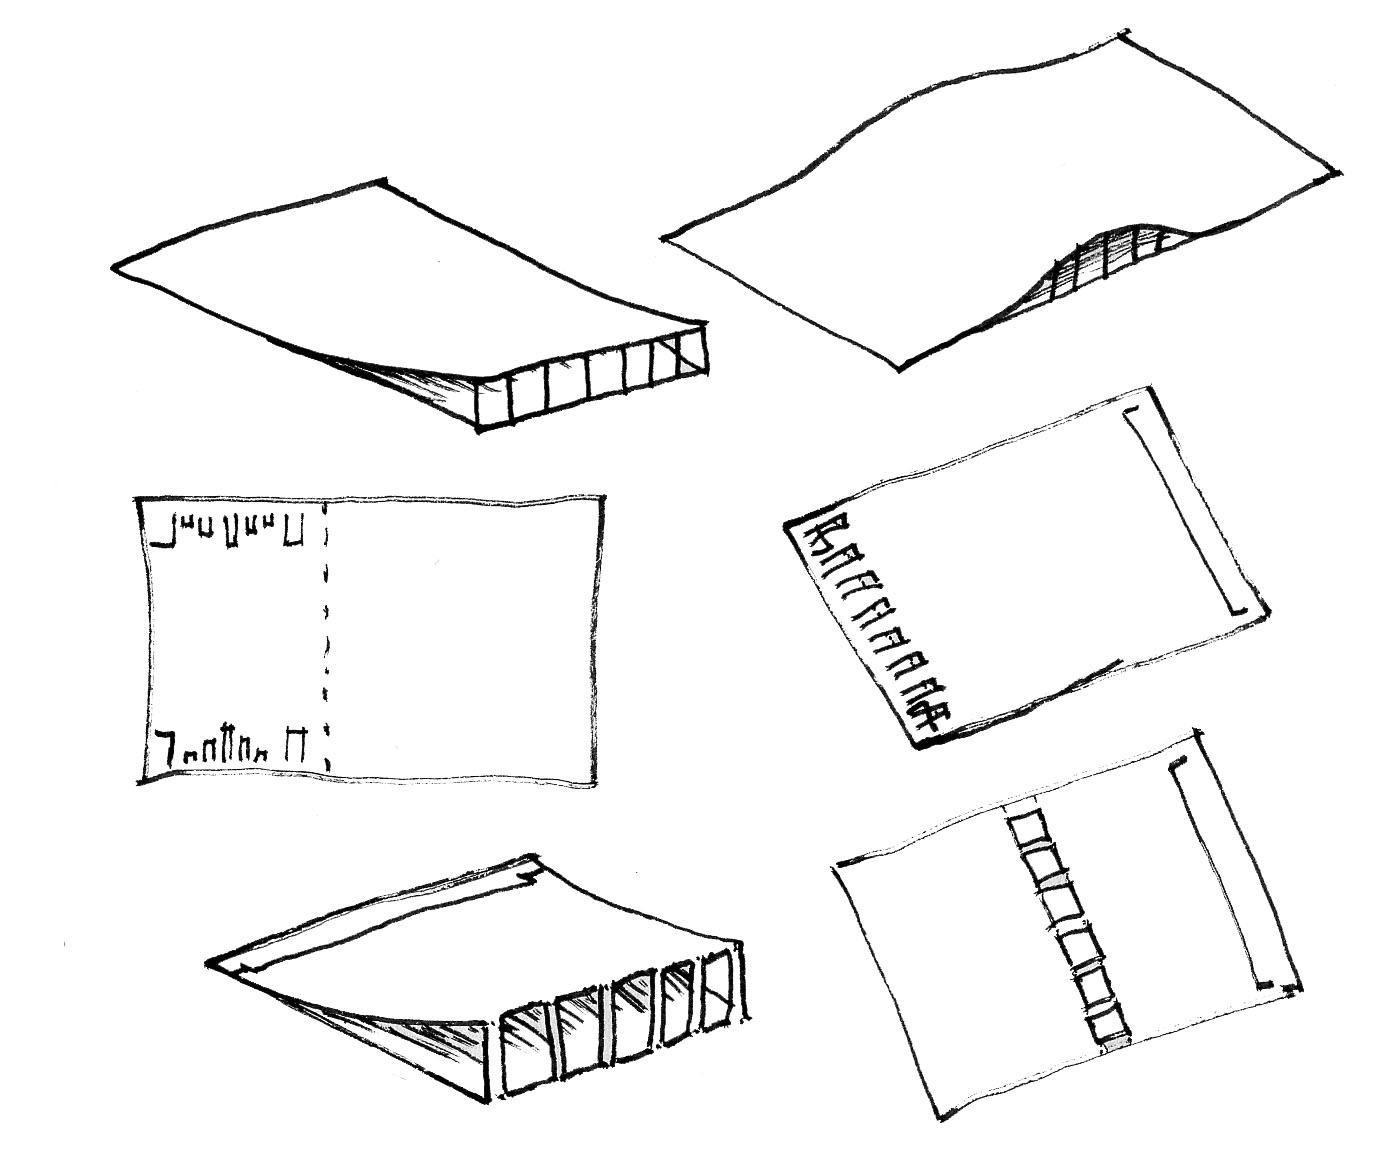 Contemporary European Architecture: Rolex Learning Center